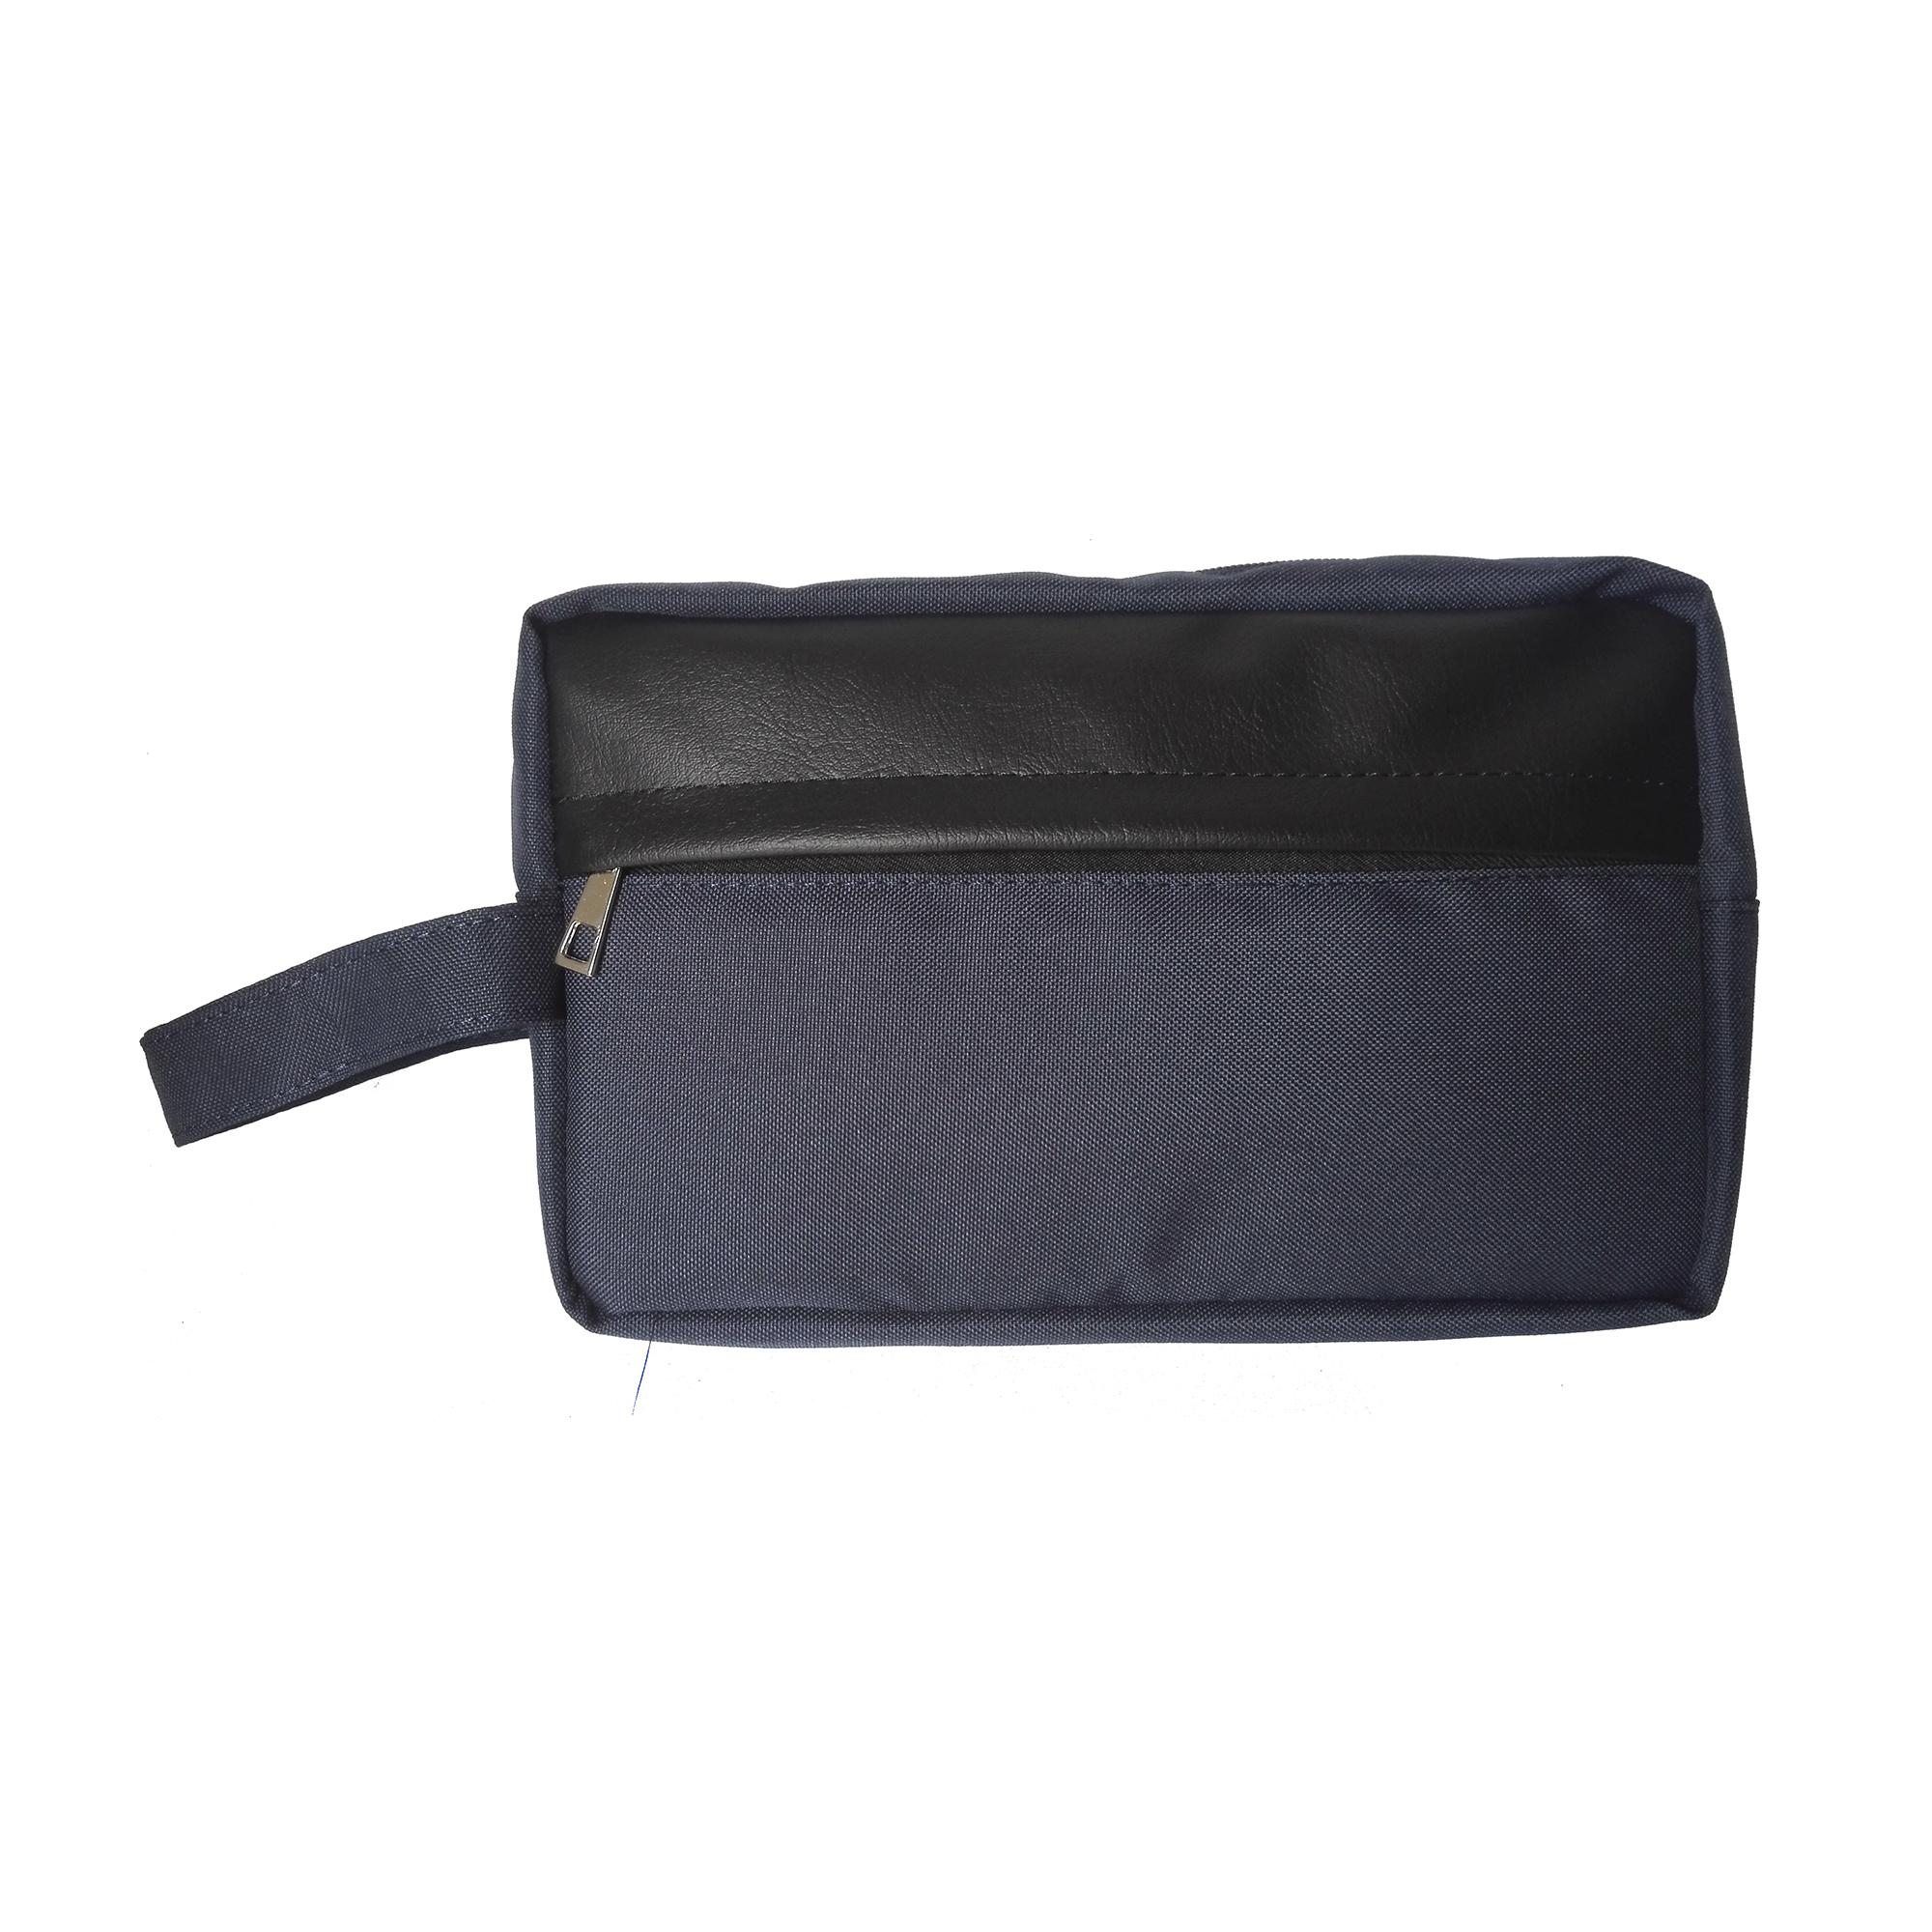 Garuda Pouch Bag - Biru Navy